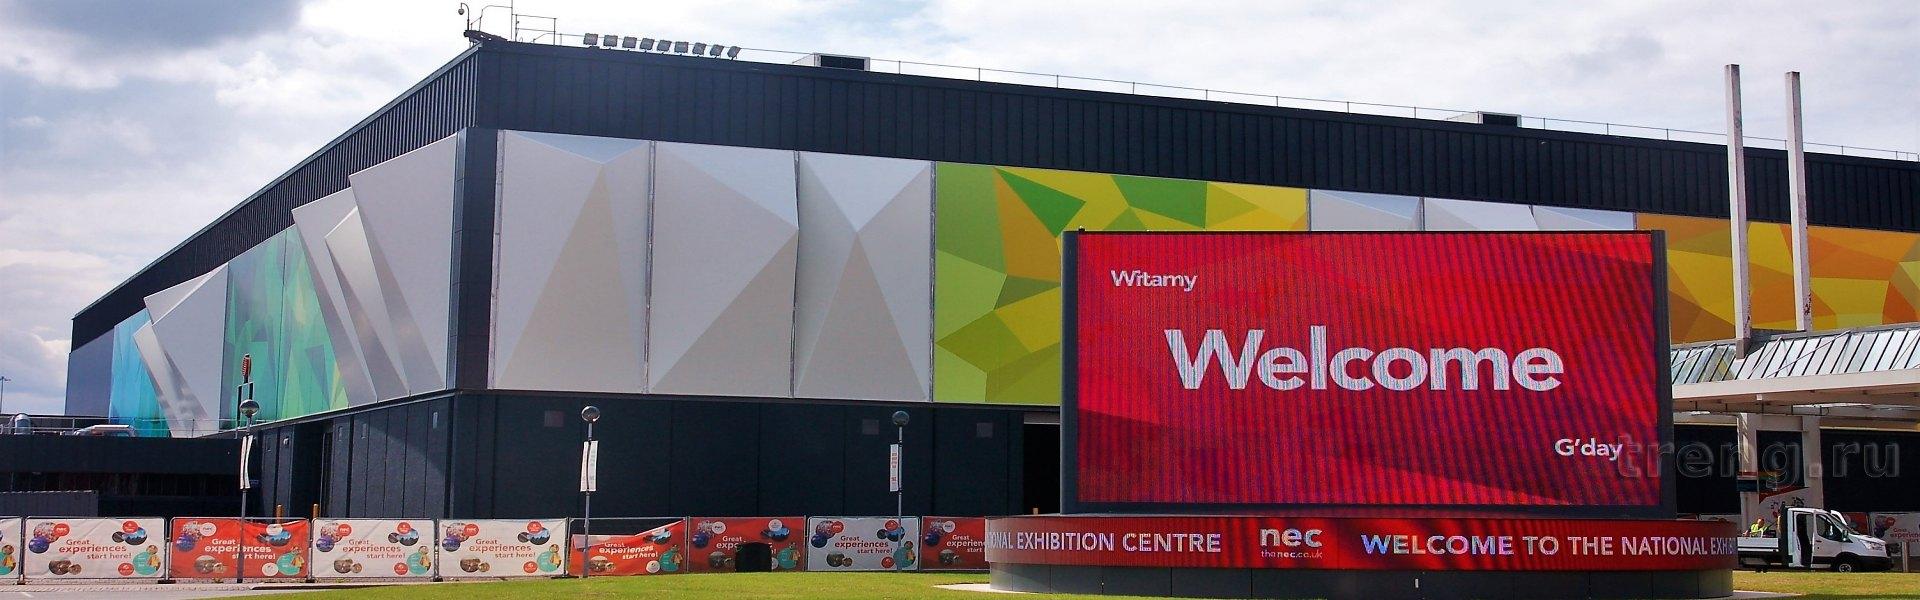 National Exhibition Centre